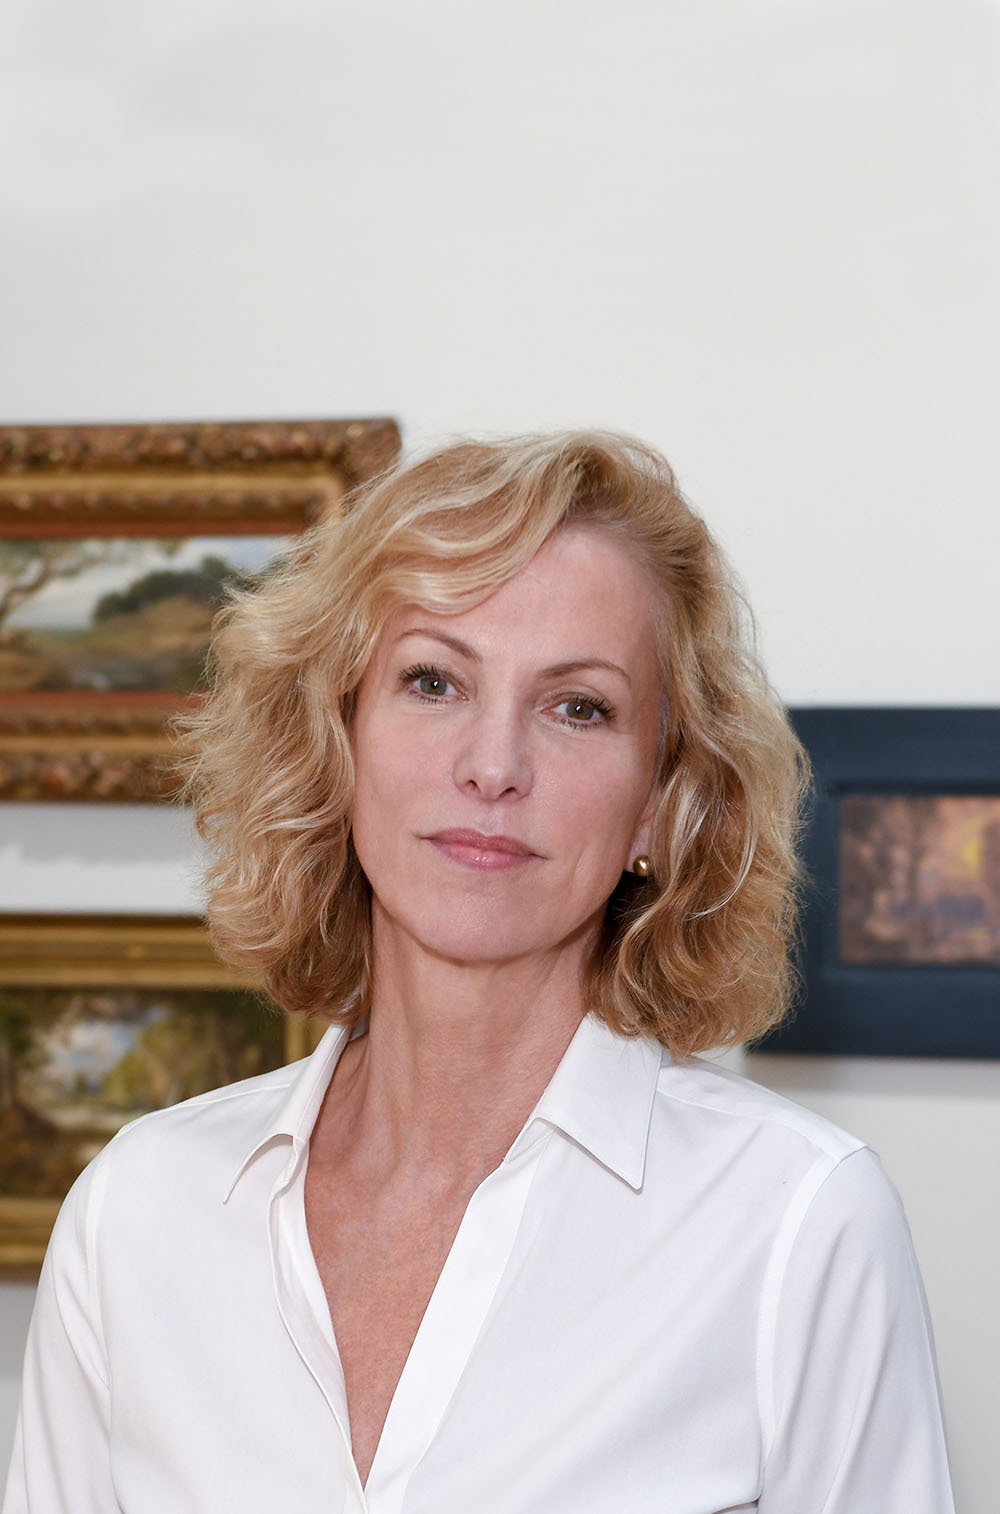 Jill Newhouse, Jill Newhouse Gallery